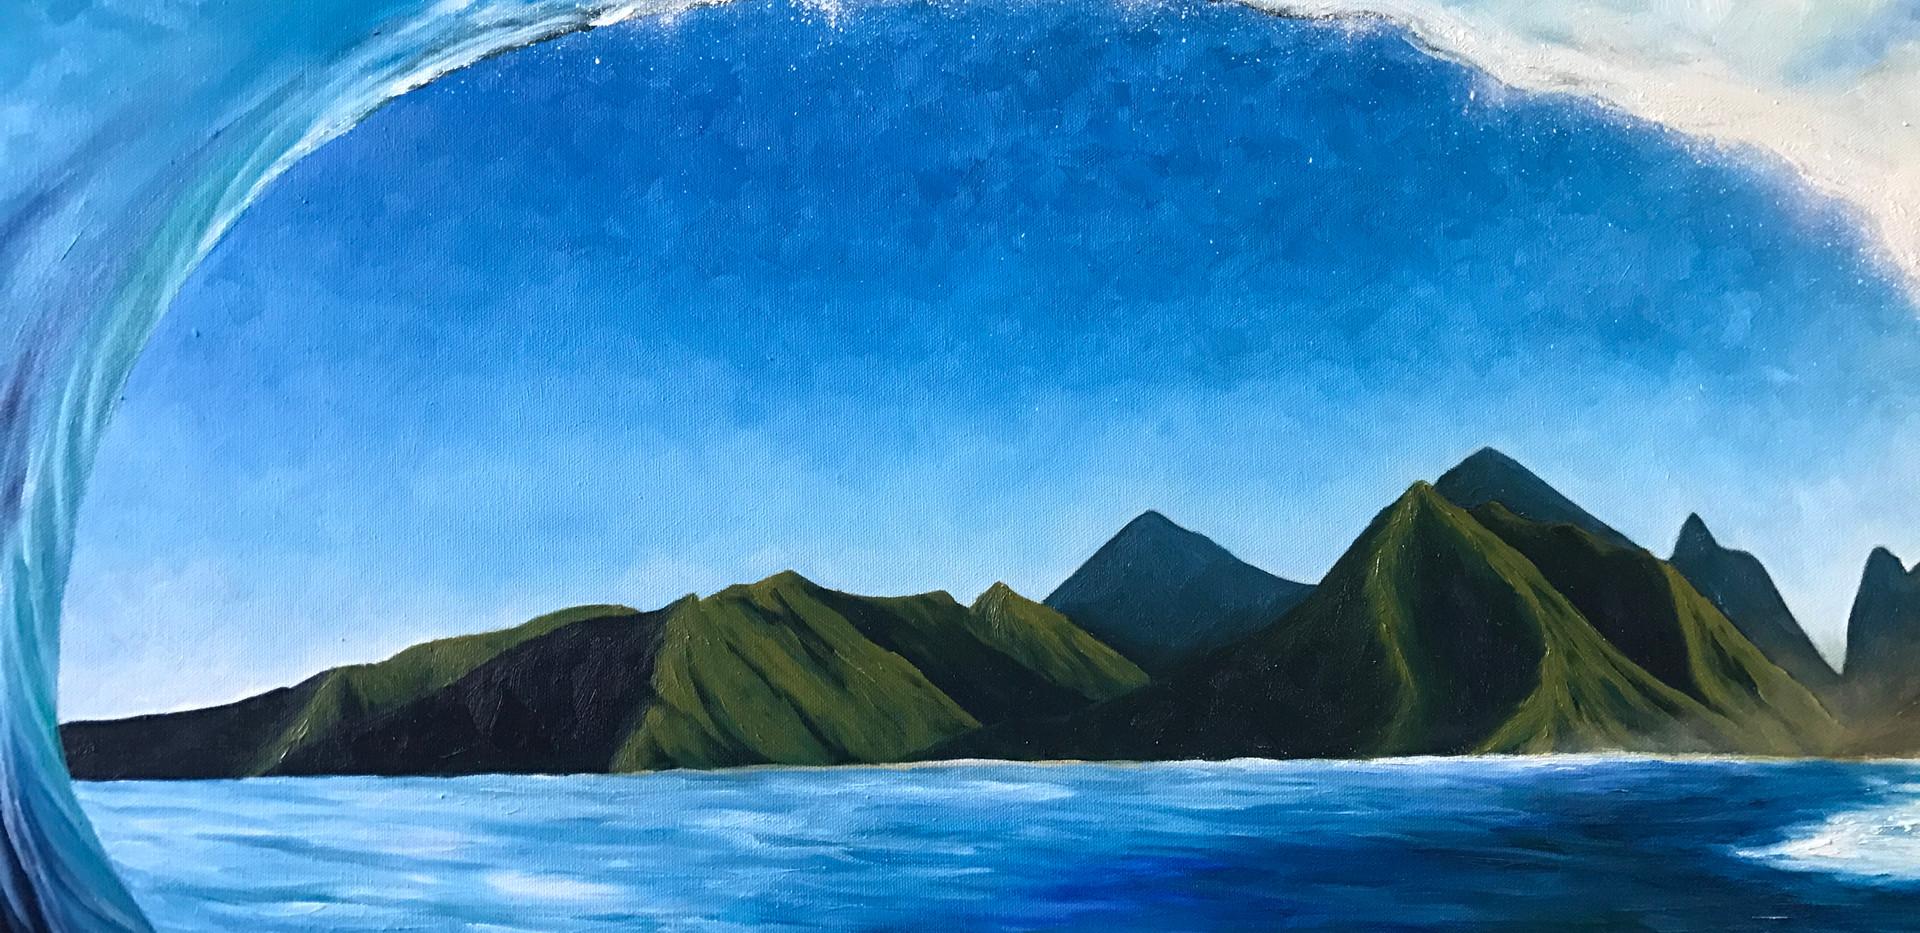 The Big Blue Wave #3